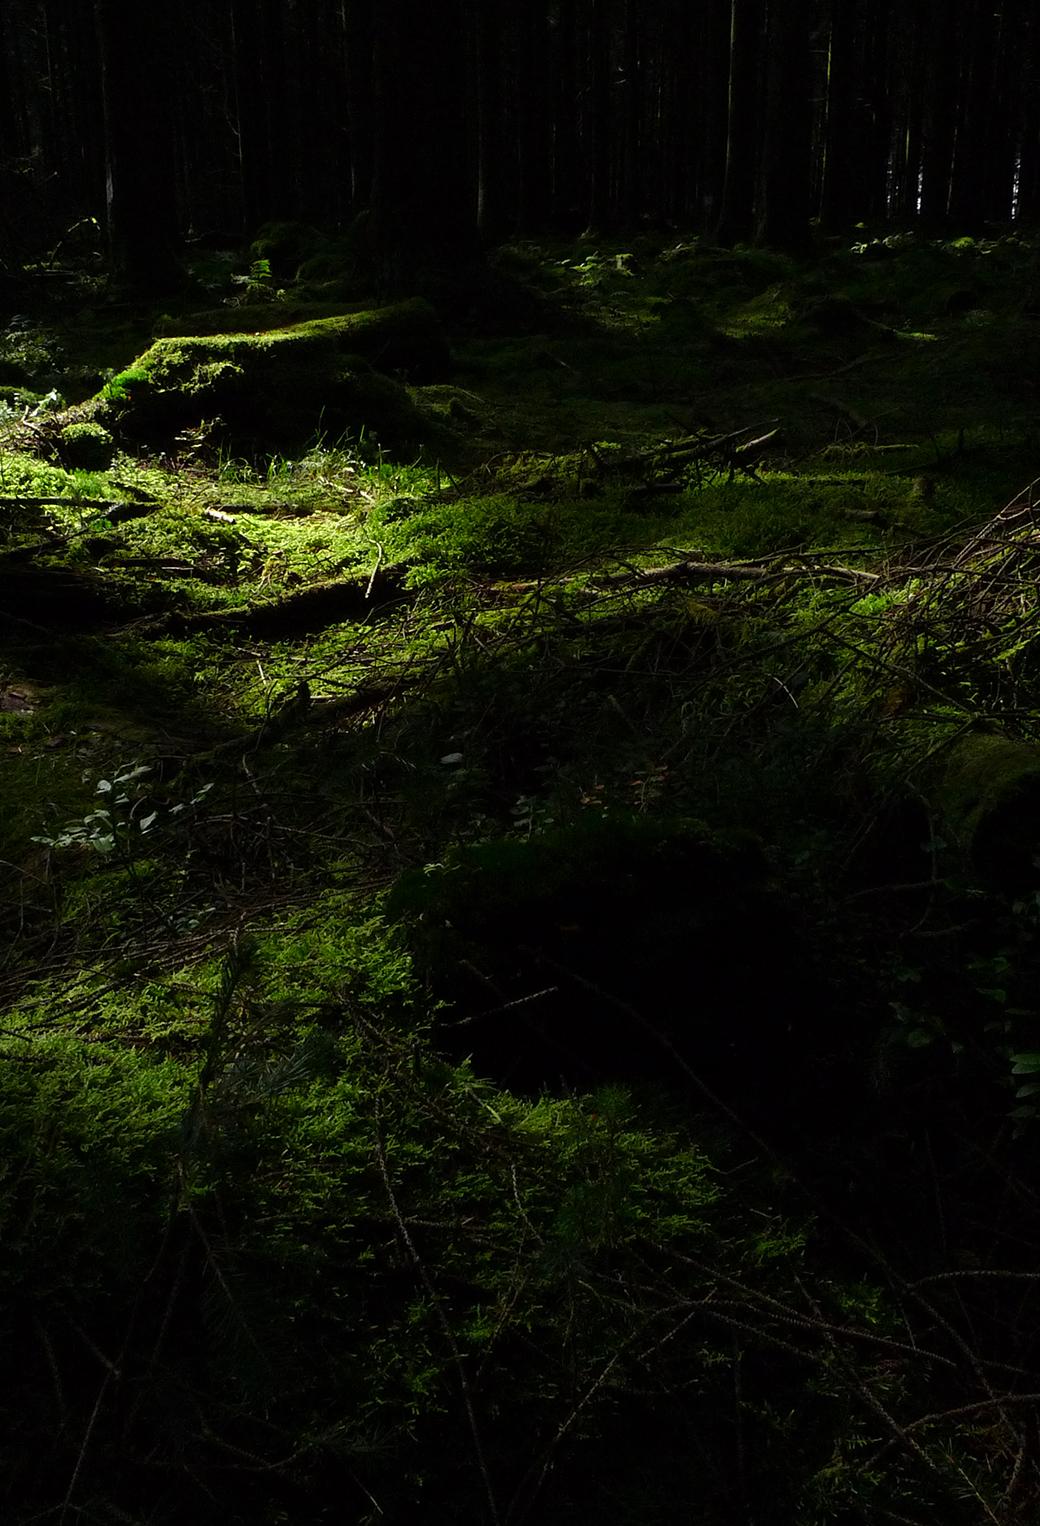 Forest Floor 3Wallpapers iPhone parallax Forest Floor